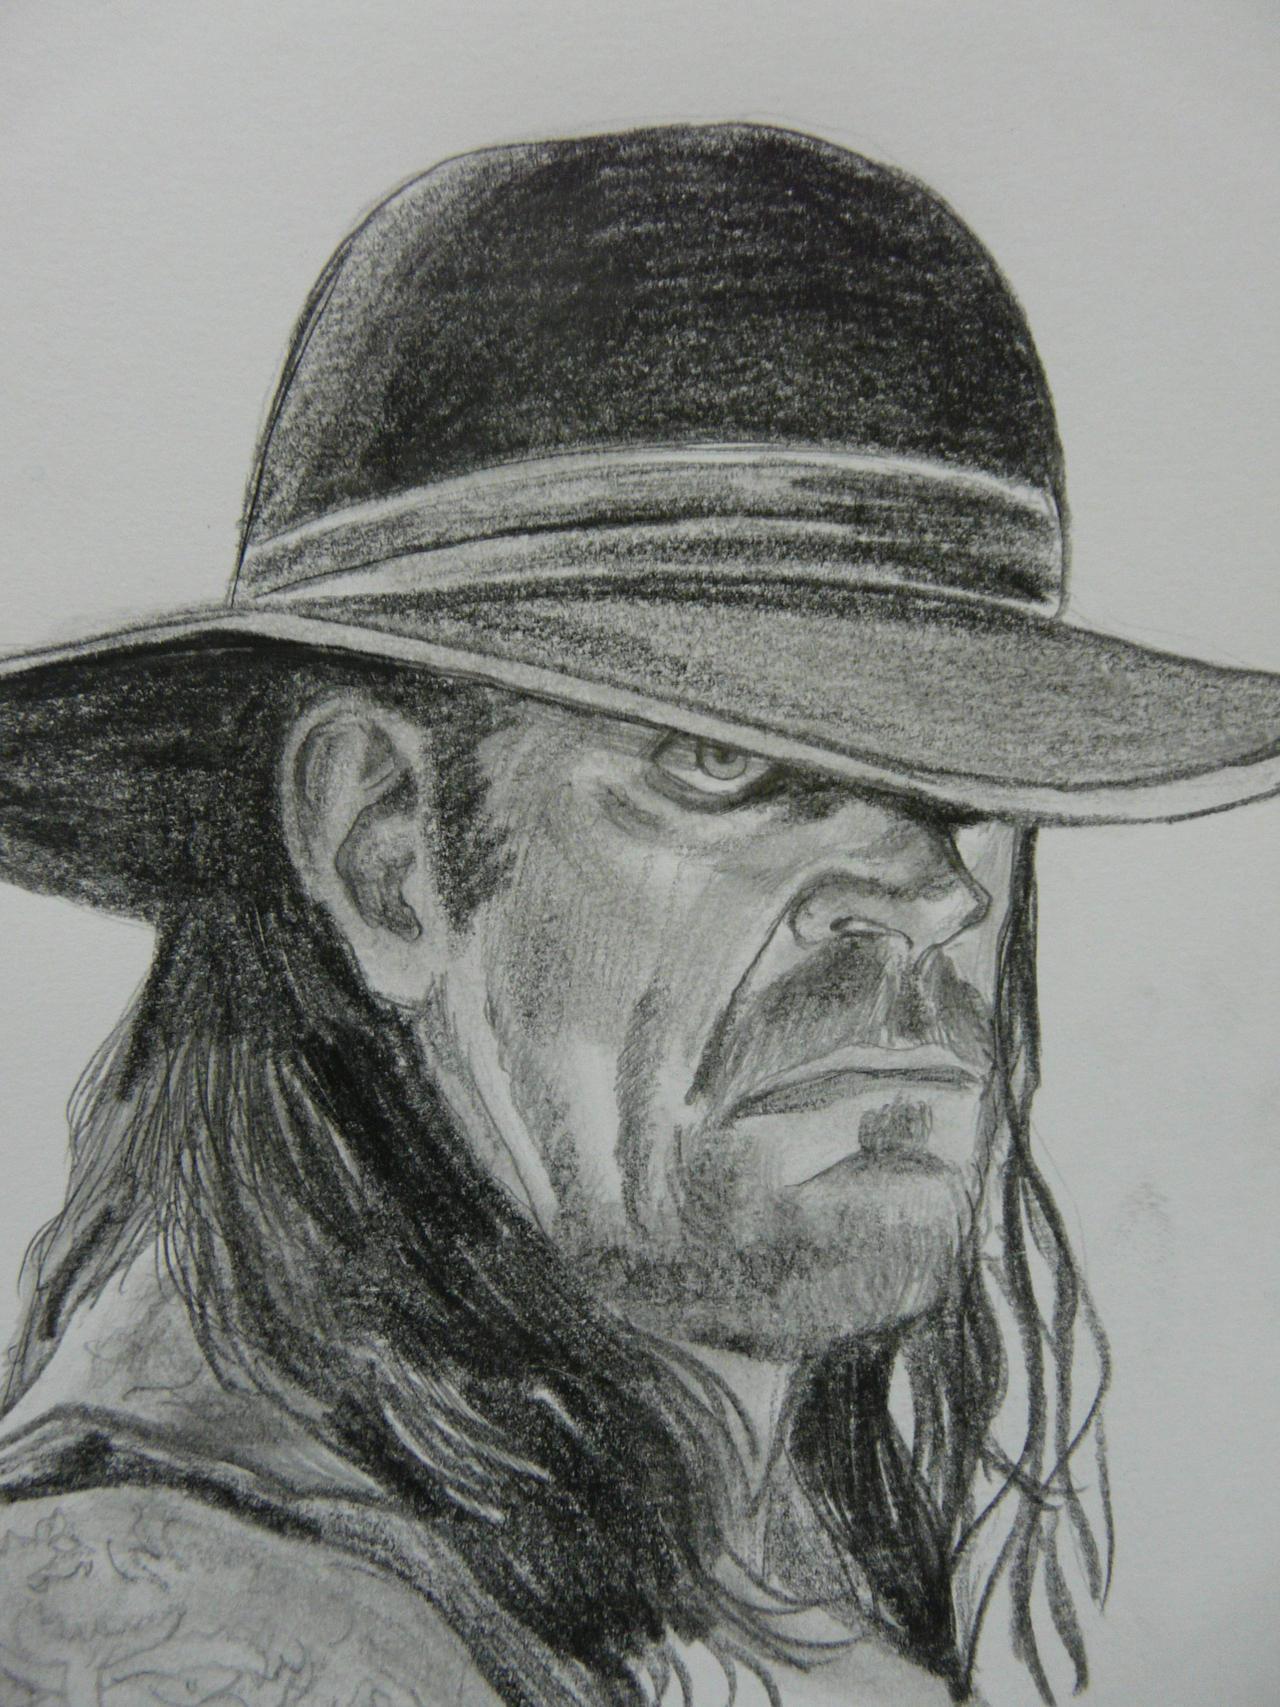 Wwe The Undertaker 1990s Wwe undertaker 5 by vinceart